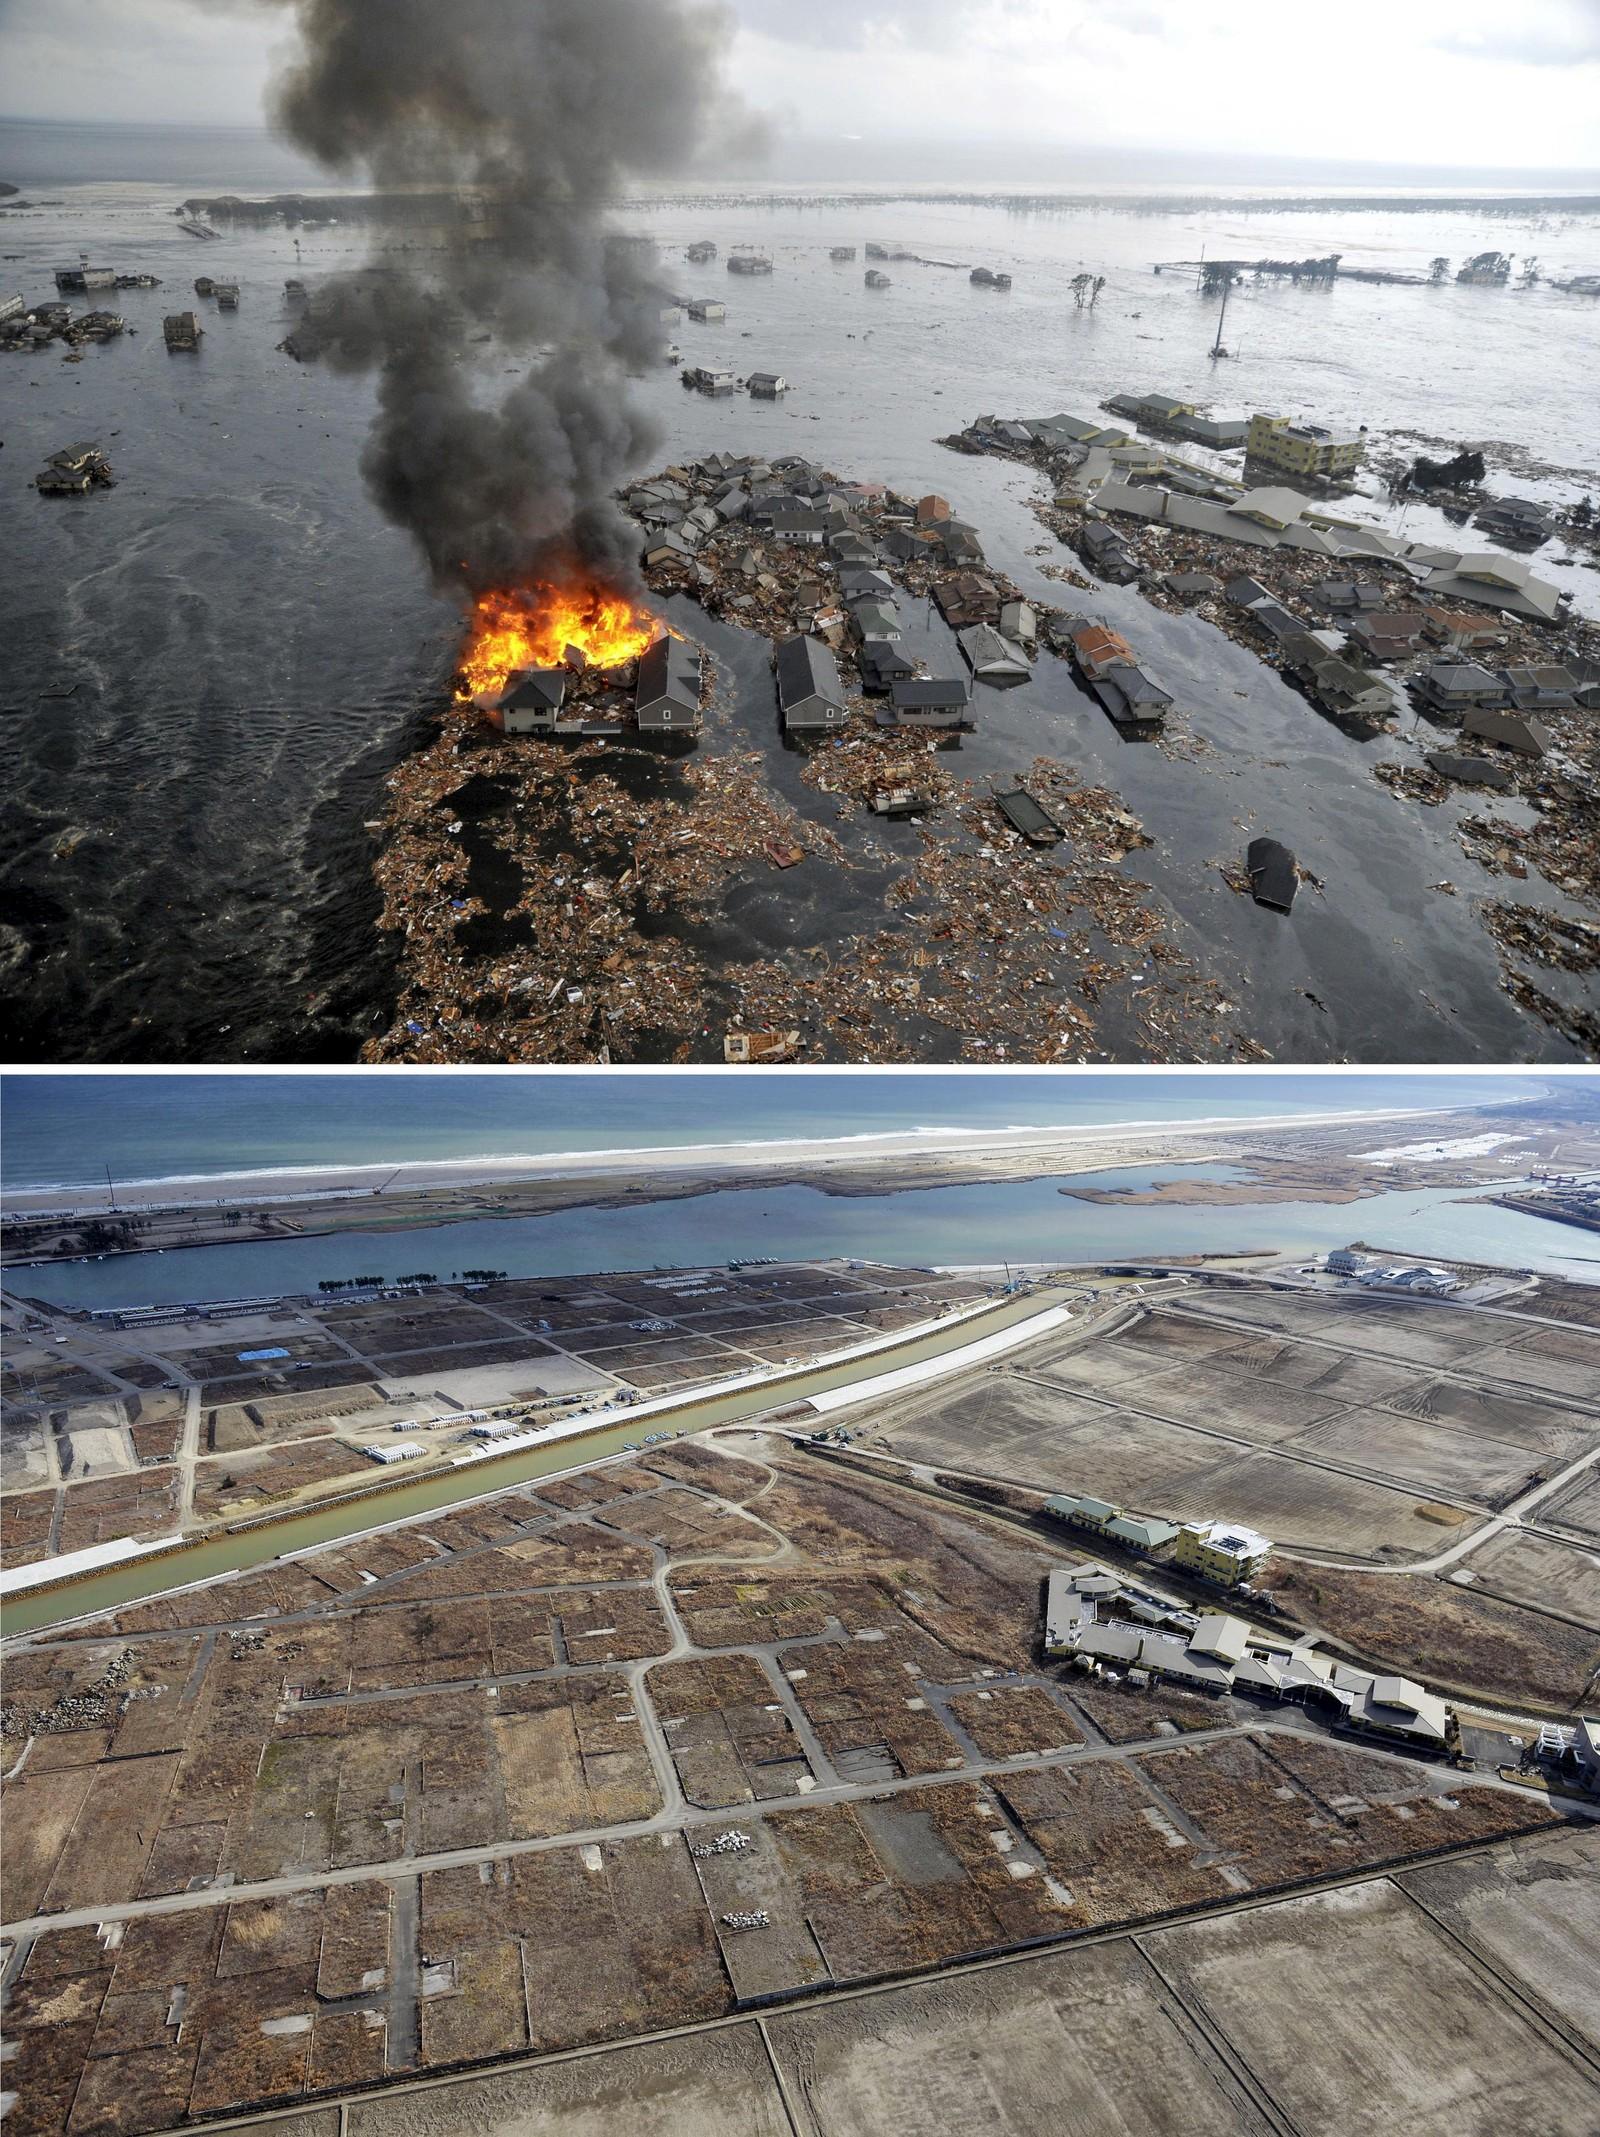 NATORI: Hele havneområder i byen Natori i det nordøstre Japan ble nærmest utryddet. Bildet til høyre viser at det samme området nå ligger i øde.